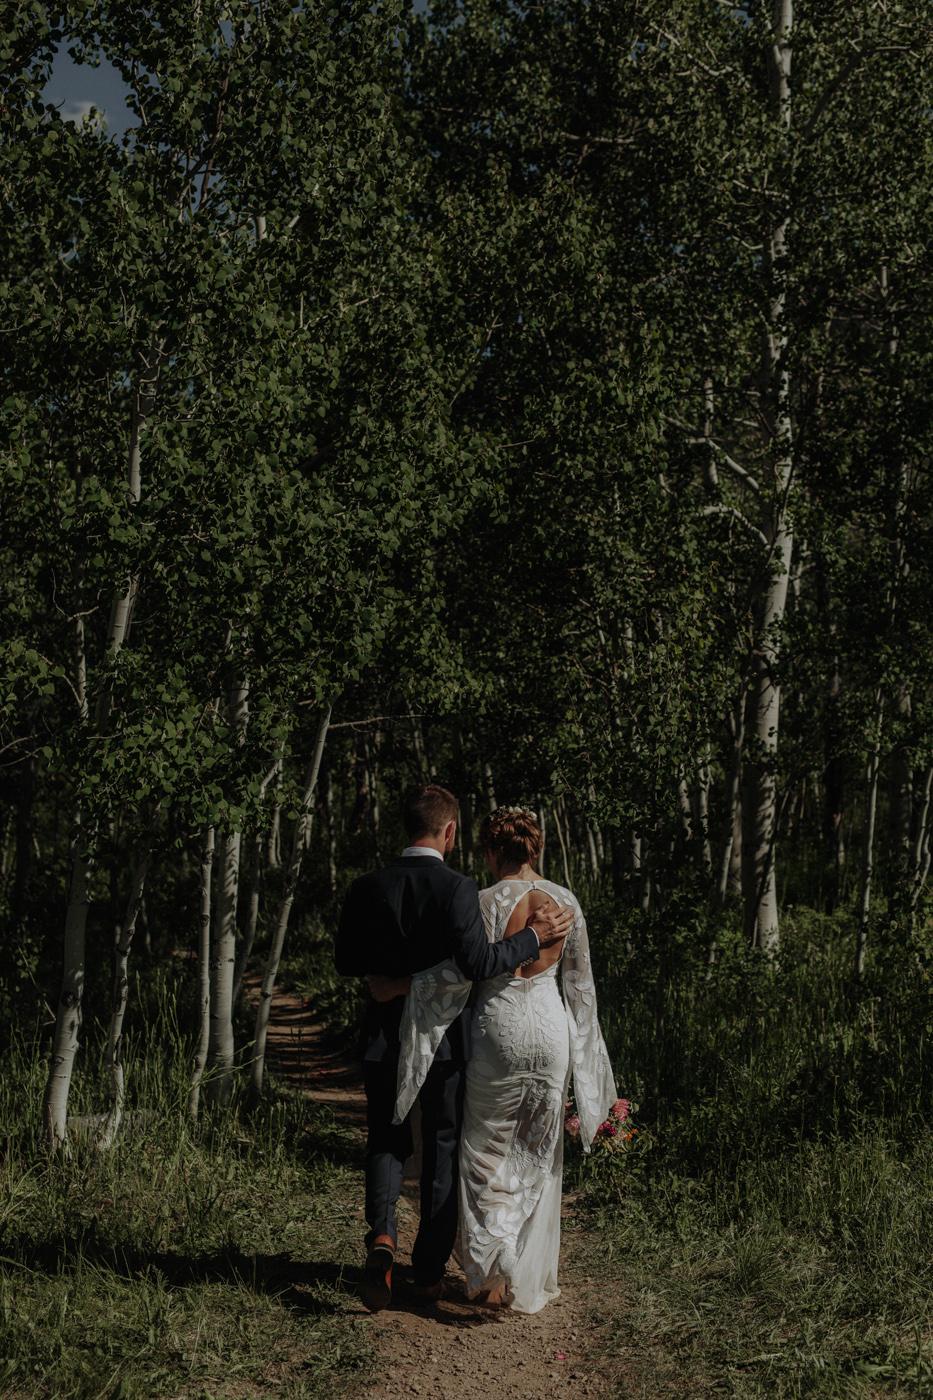 woods-walk-trail-crested-butte-colorado-wedding-73.jpg